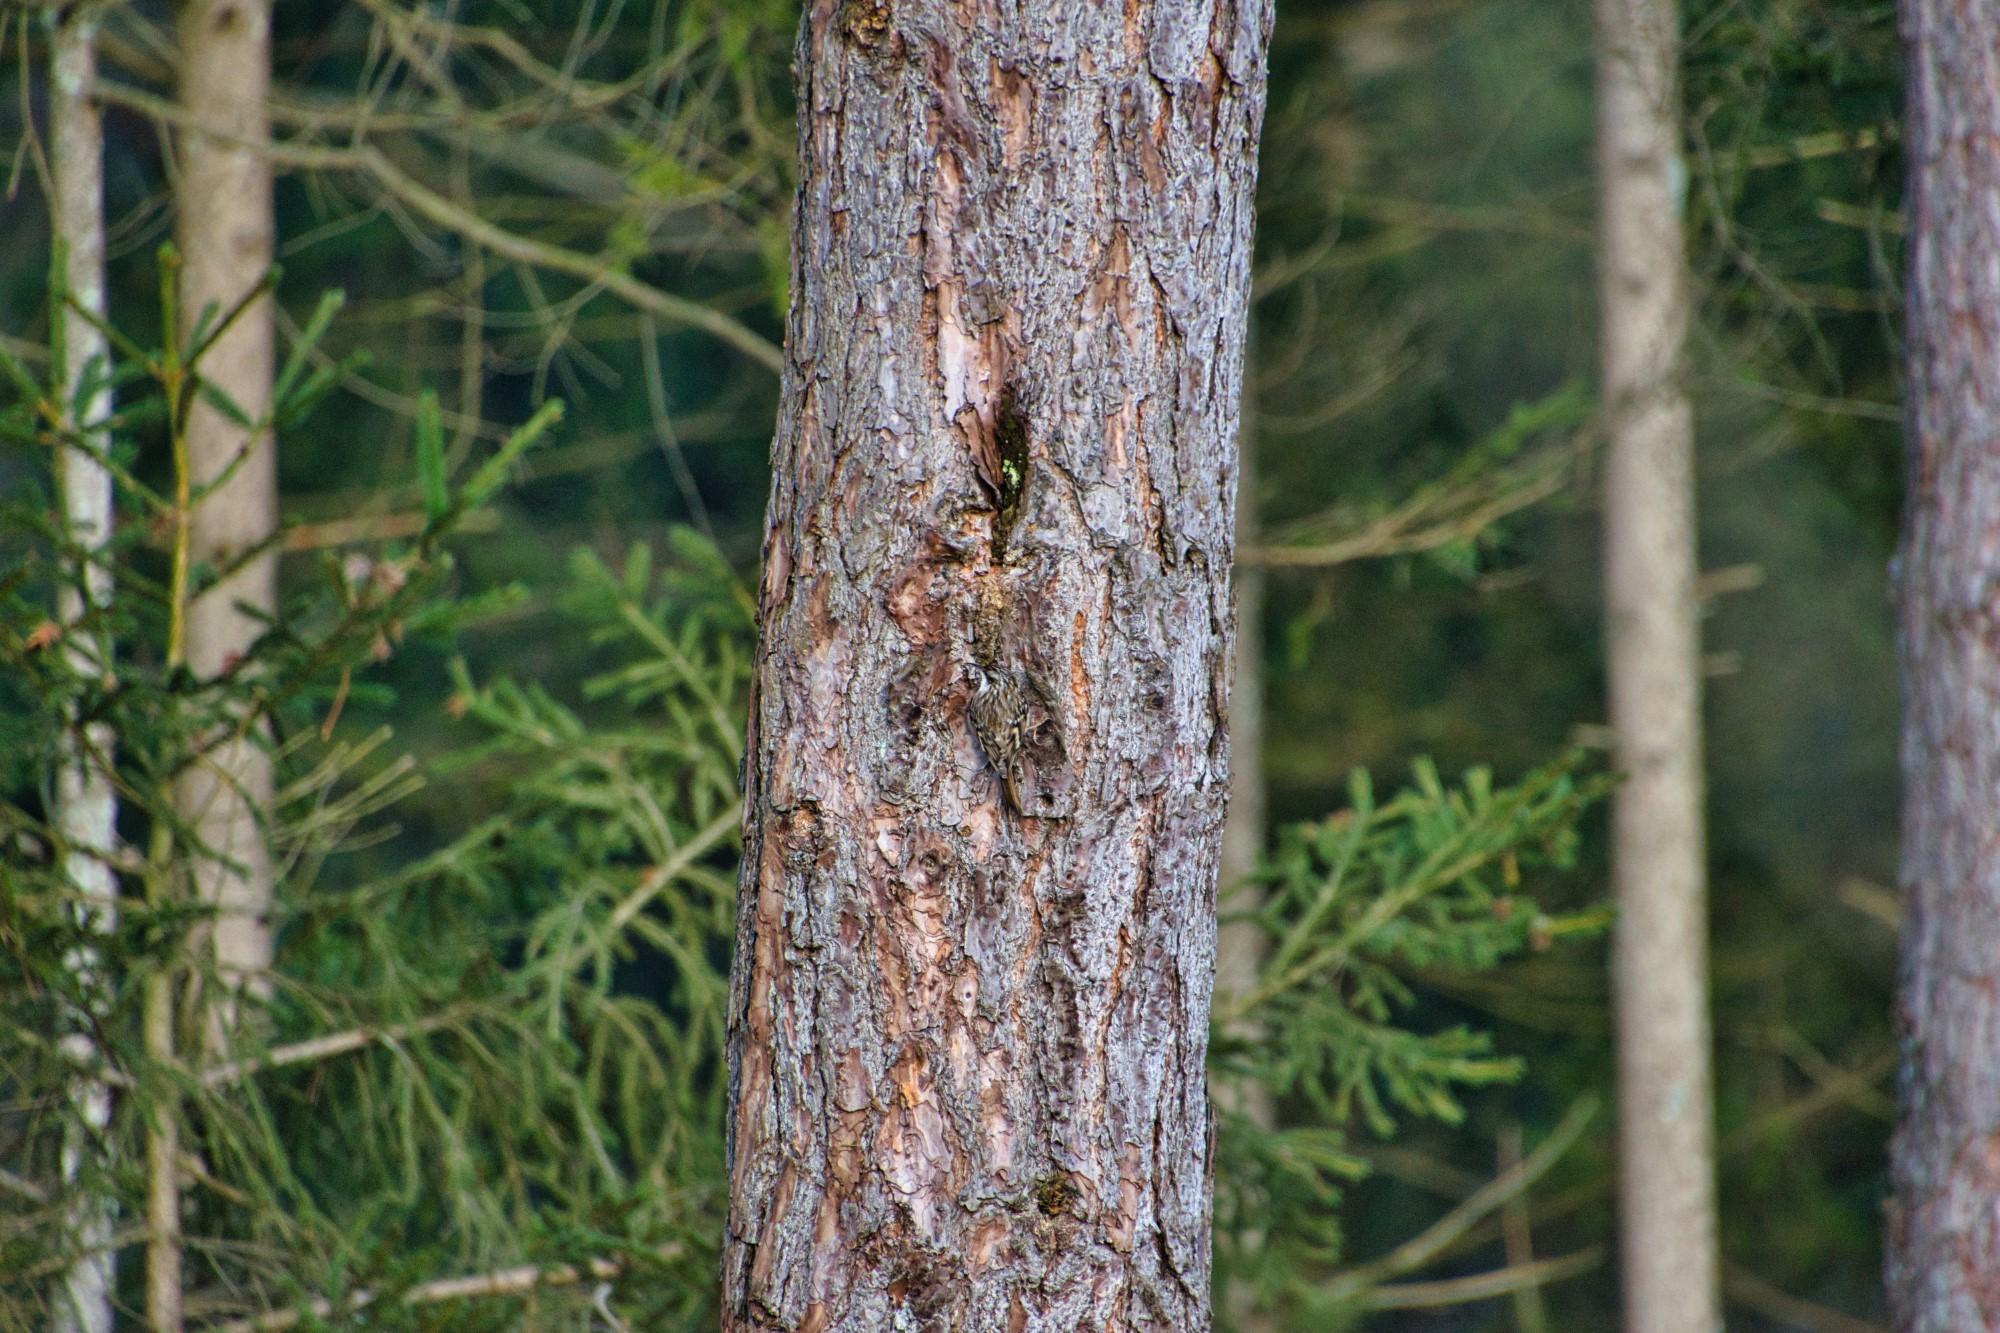 Baumläufer gut getarnt